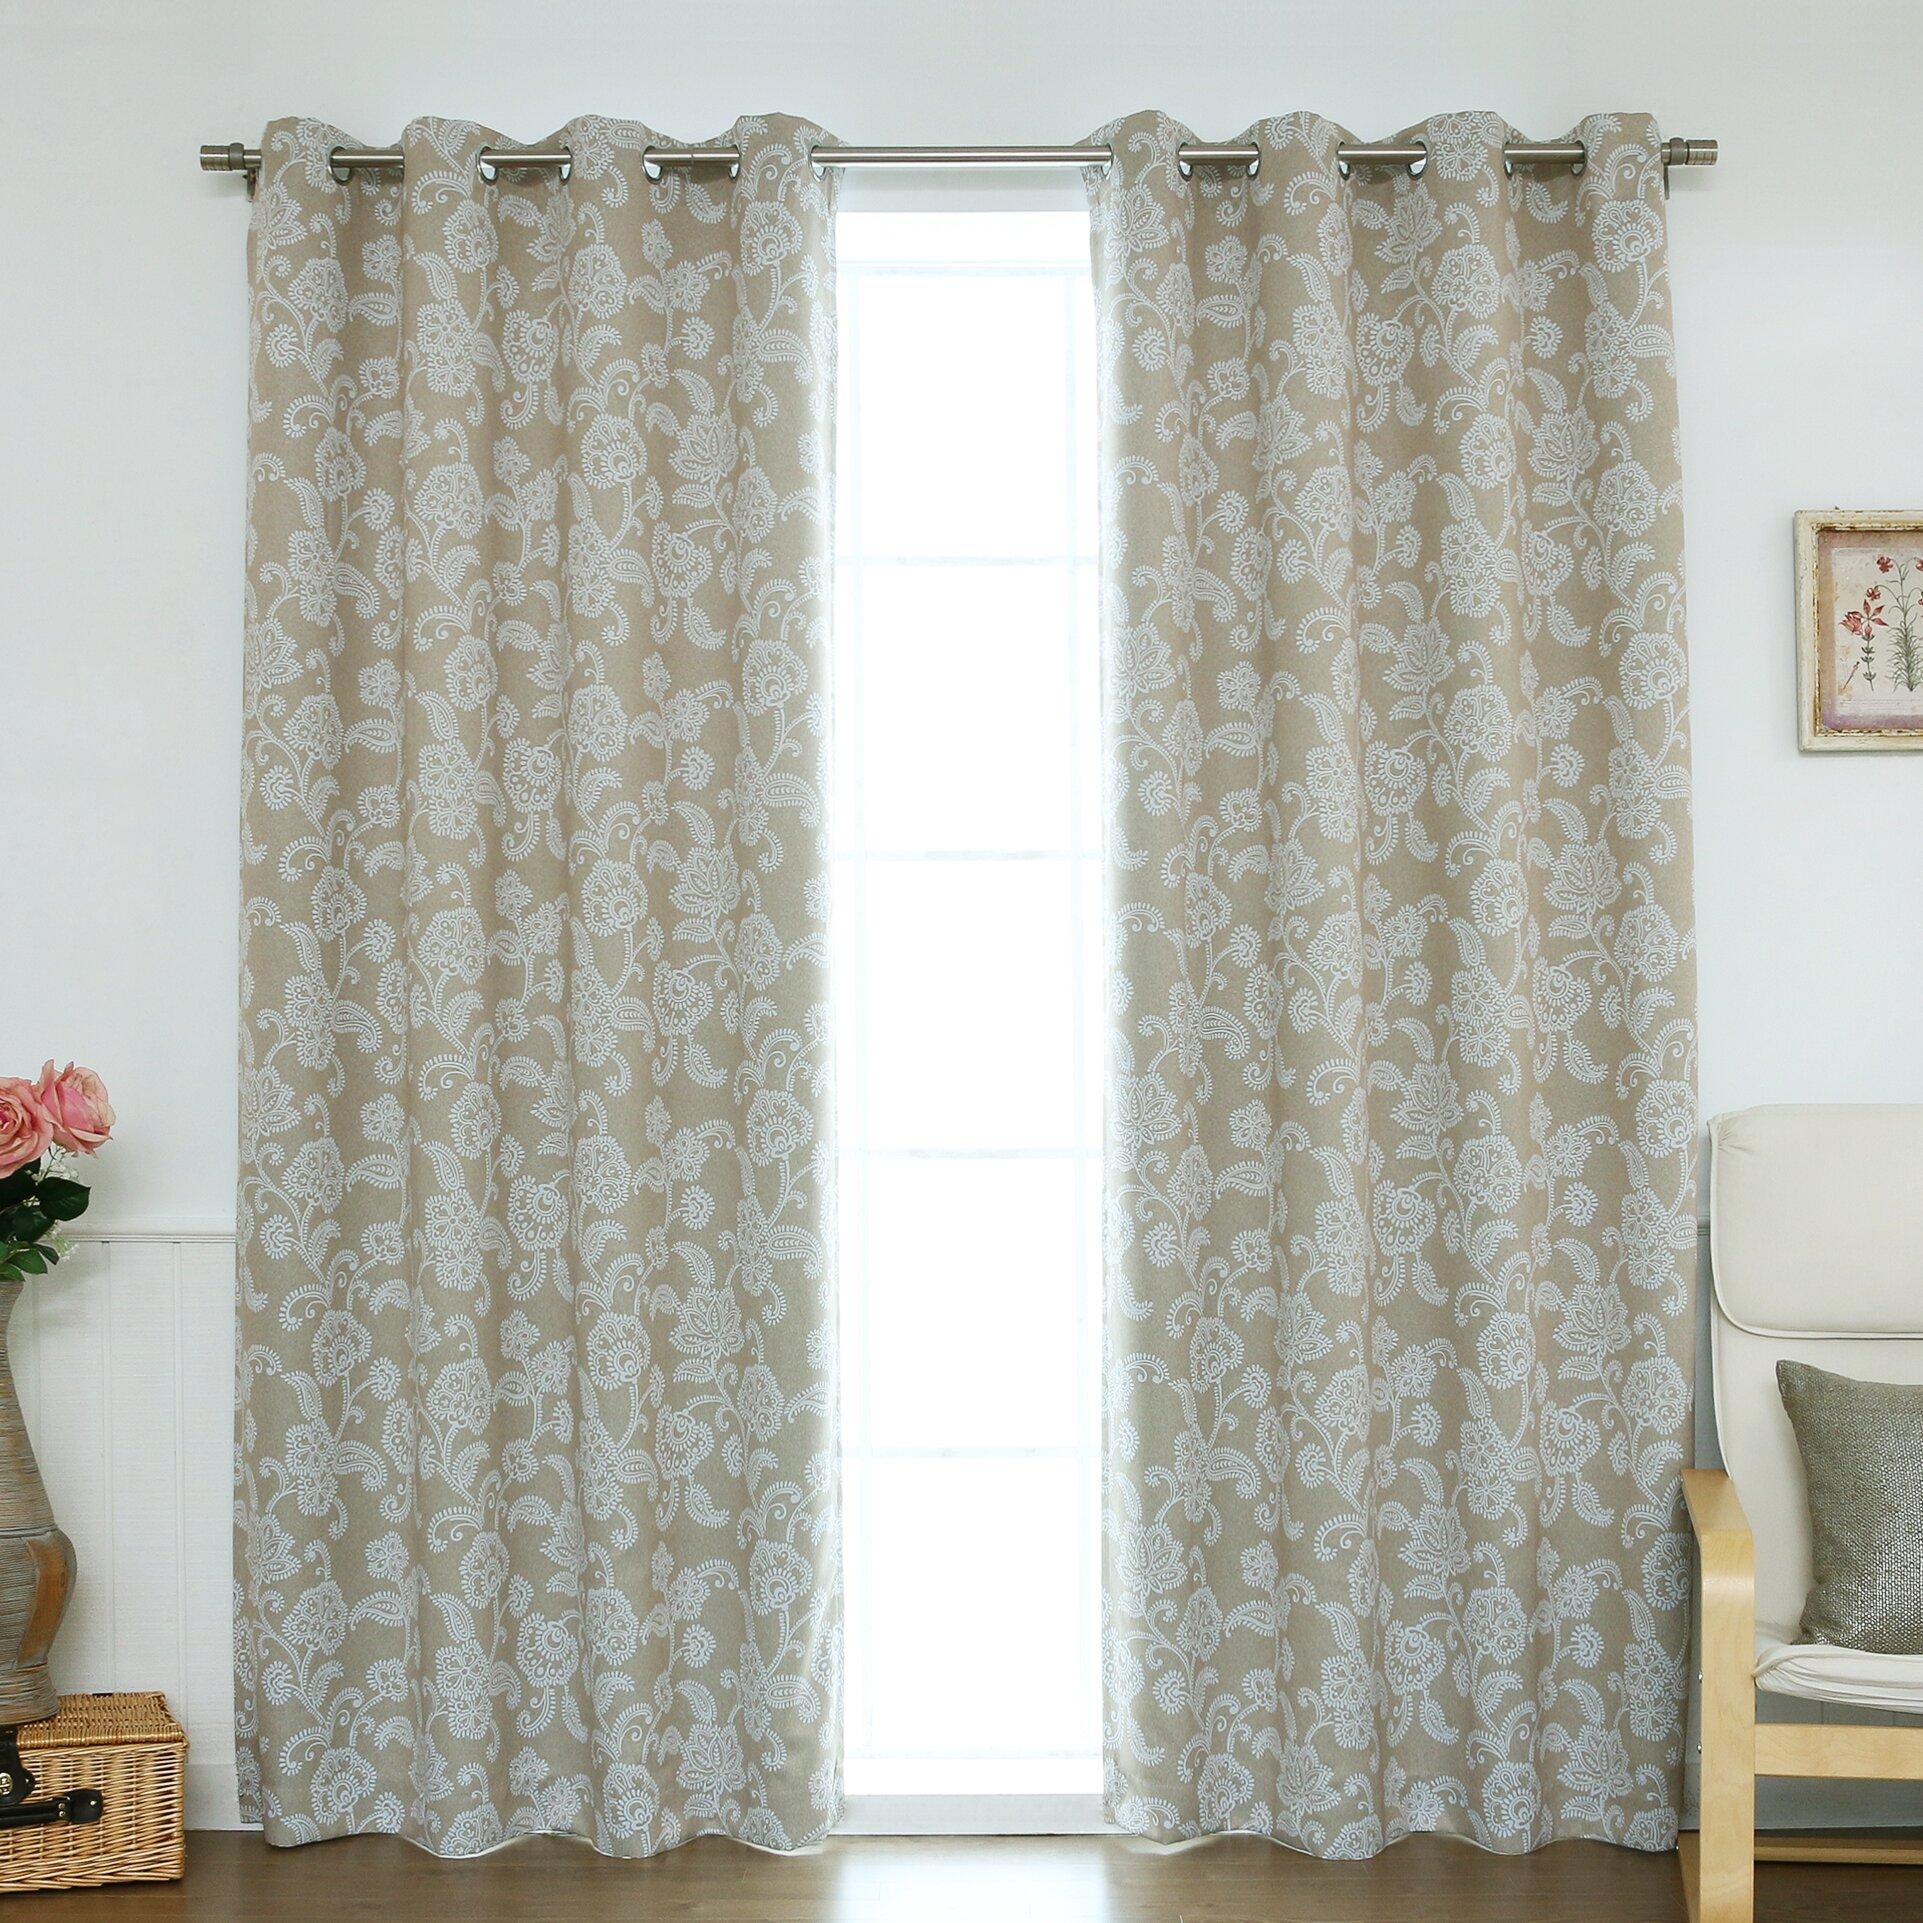 Best Home Fashion Inc Floral Vine Room Darkening Curtain Panels Reviews Wayfair